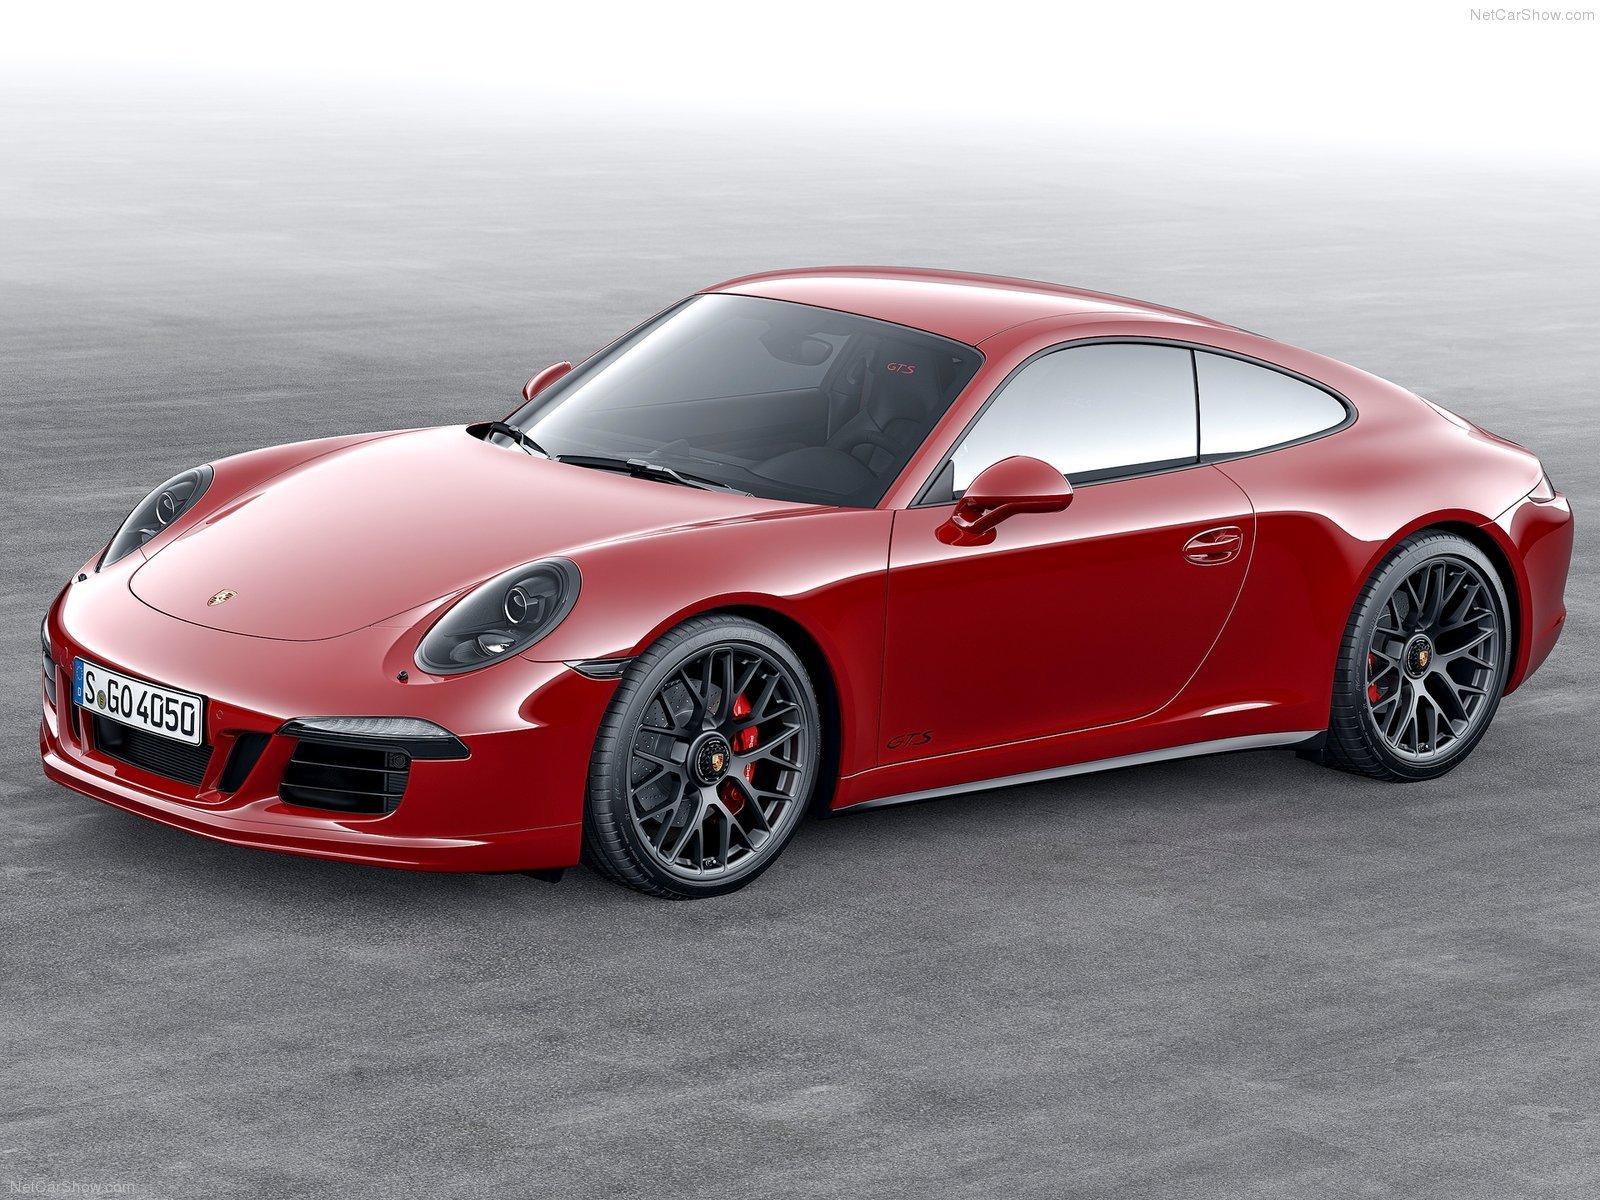 porsche 911 carrera gts 2015 coupe convertible cars 2015 wallpaper 1600x1200 523310 wallpaperup